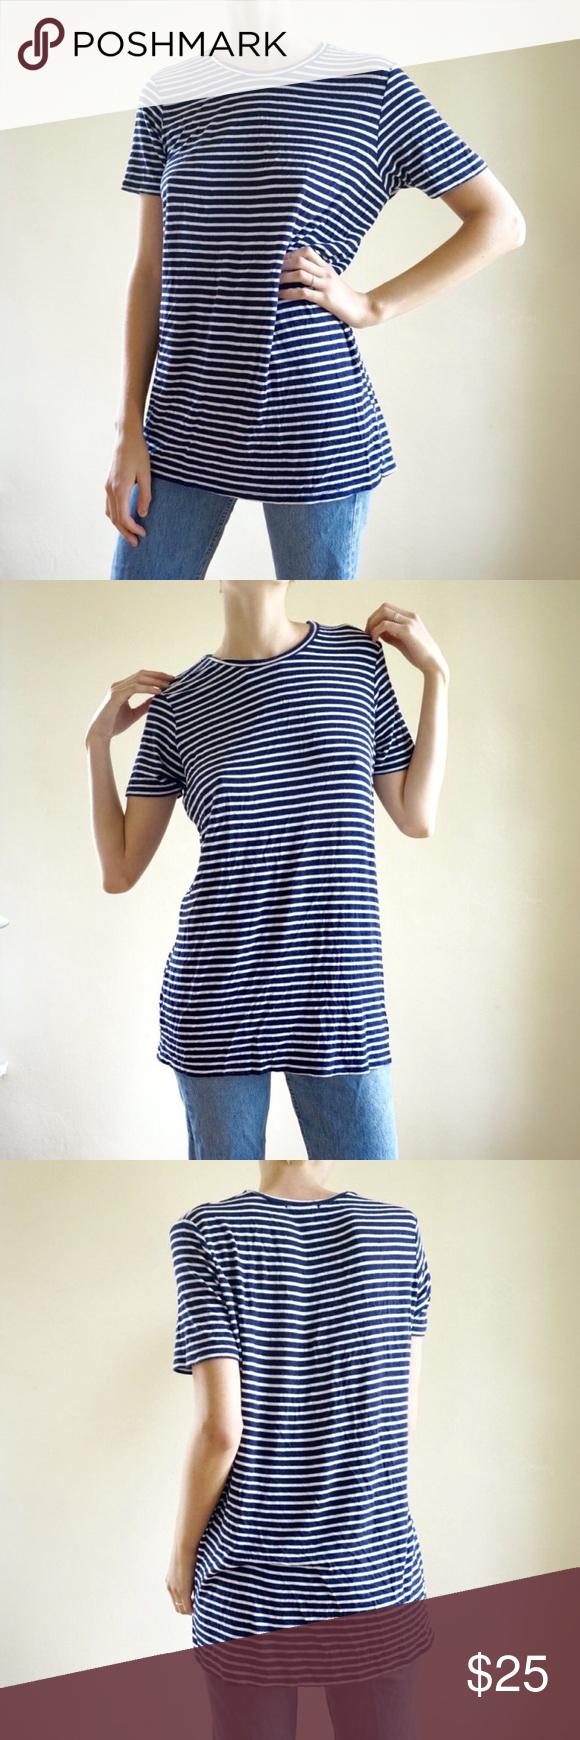 4fc0f390bb1c Brandy Melville Luana shirt dress Brandy Melville navy and white short  sleeve tunic / tshirt dress